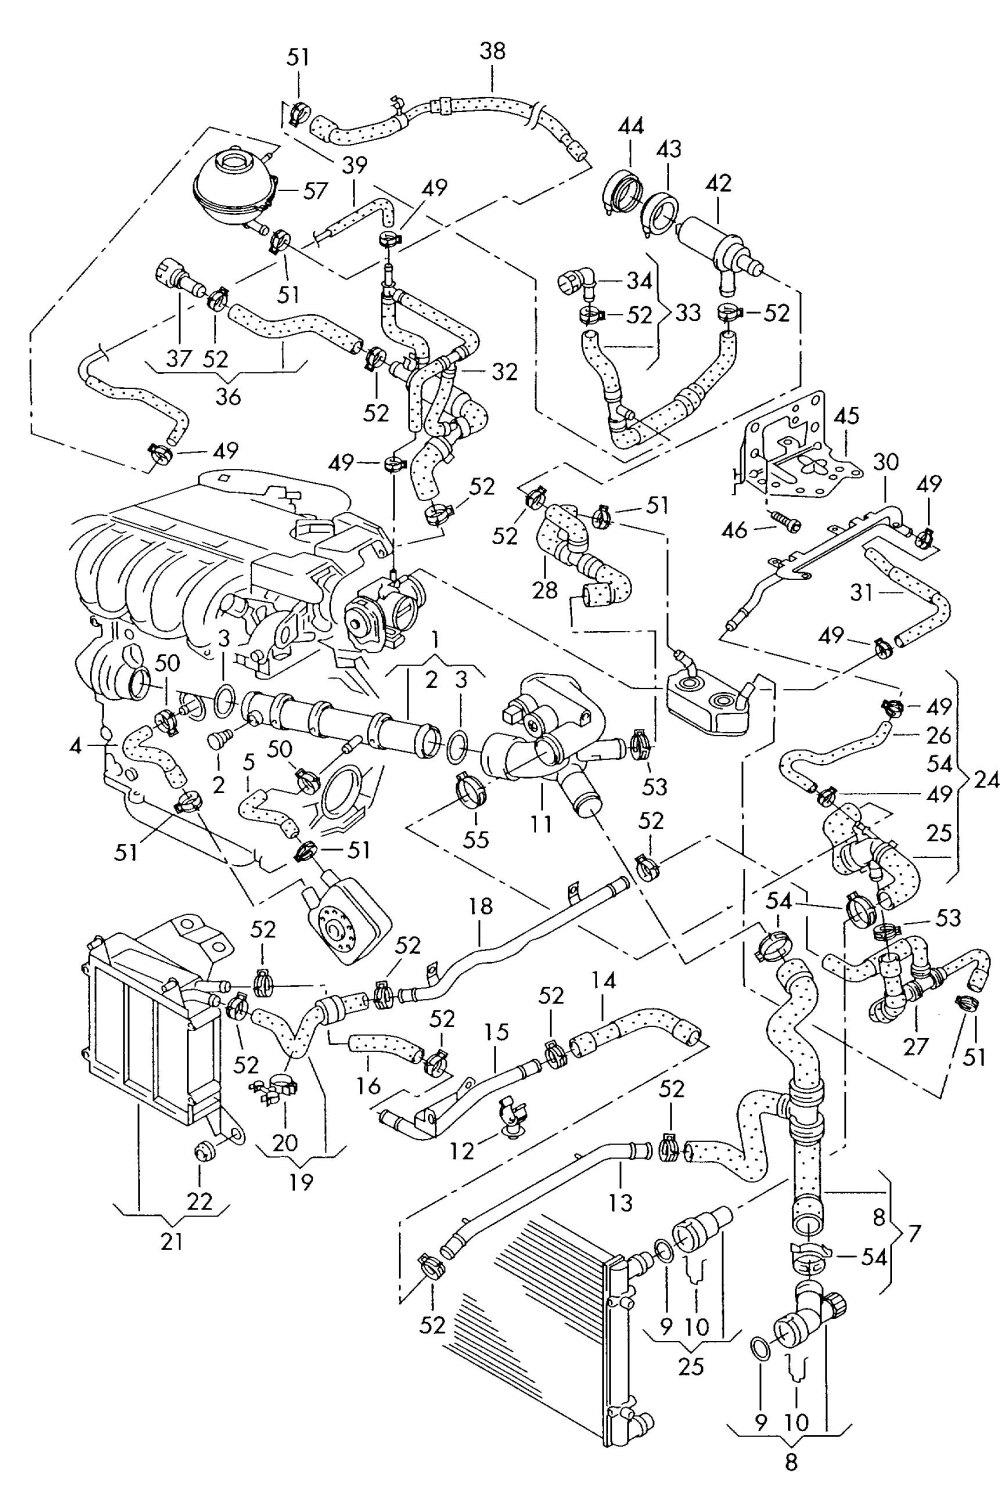 medium resolution of vw jetta 2 0 engine wiring diagram wiring library rh 93 codingcommunity de mk4 jetta 2 0 engine diagram 2002 jetta engine diagram